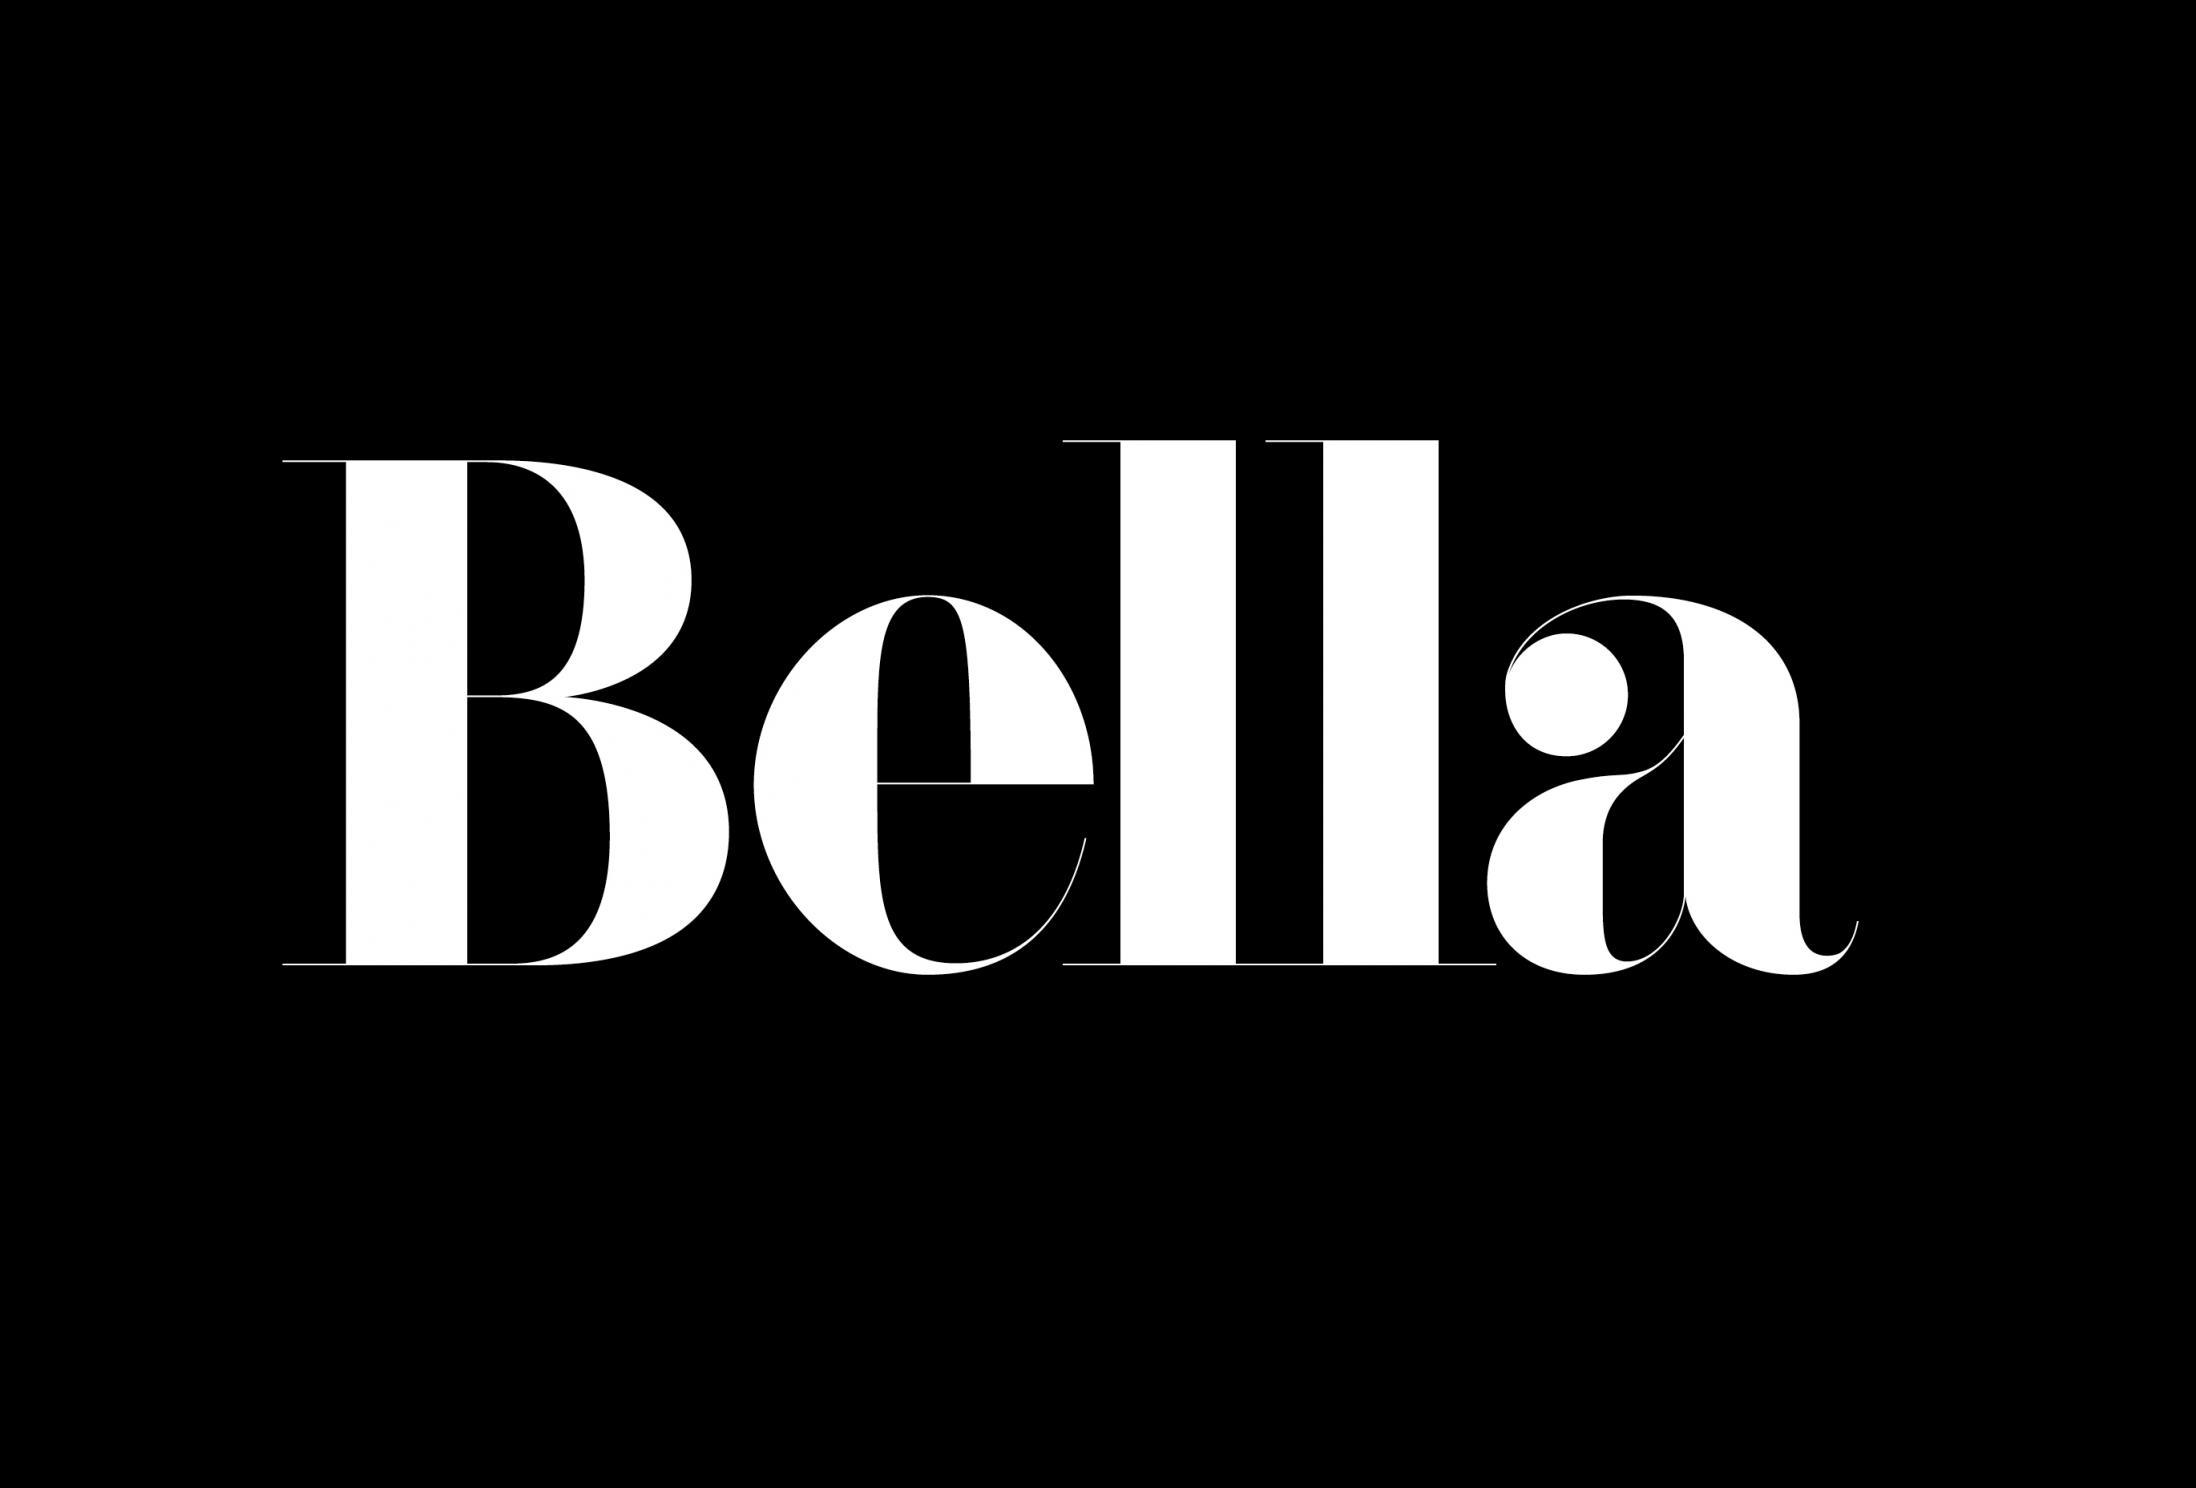 Bella display font